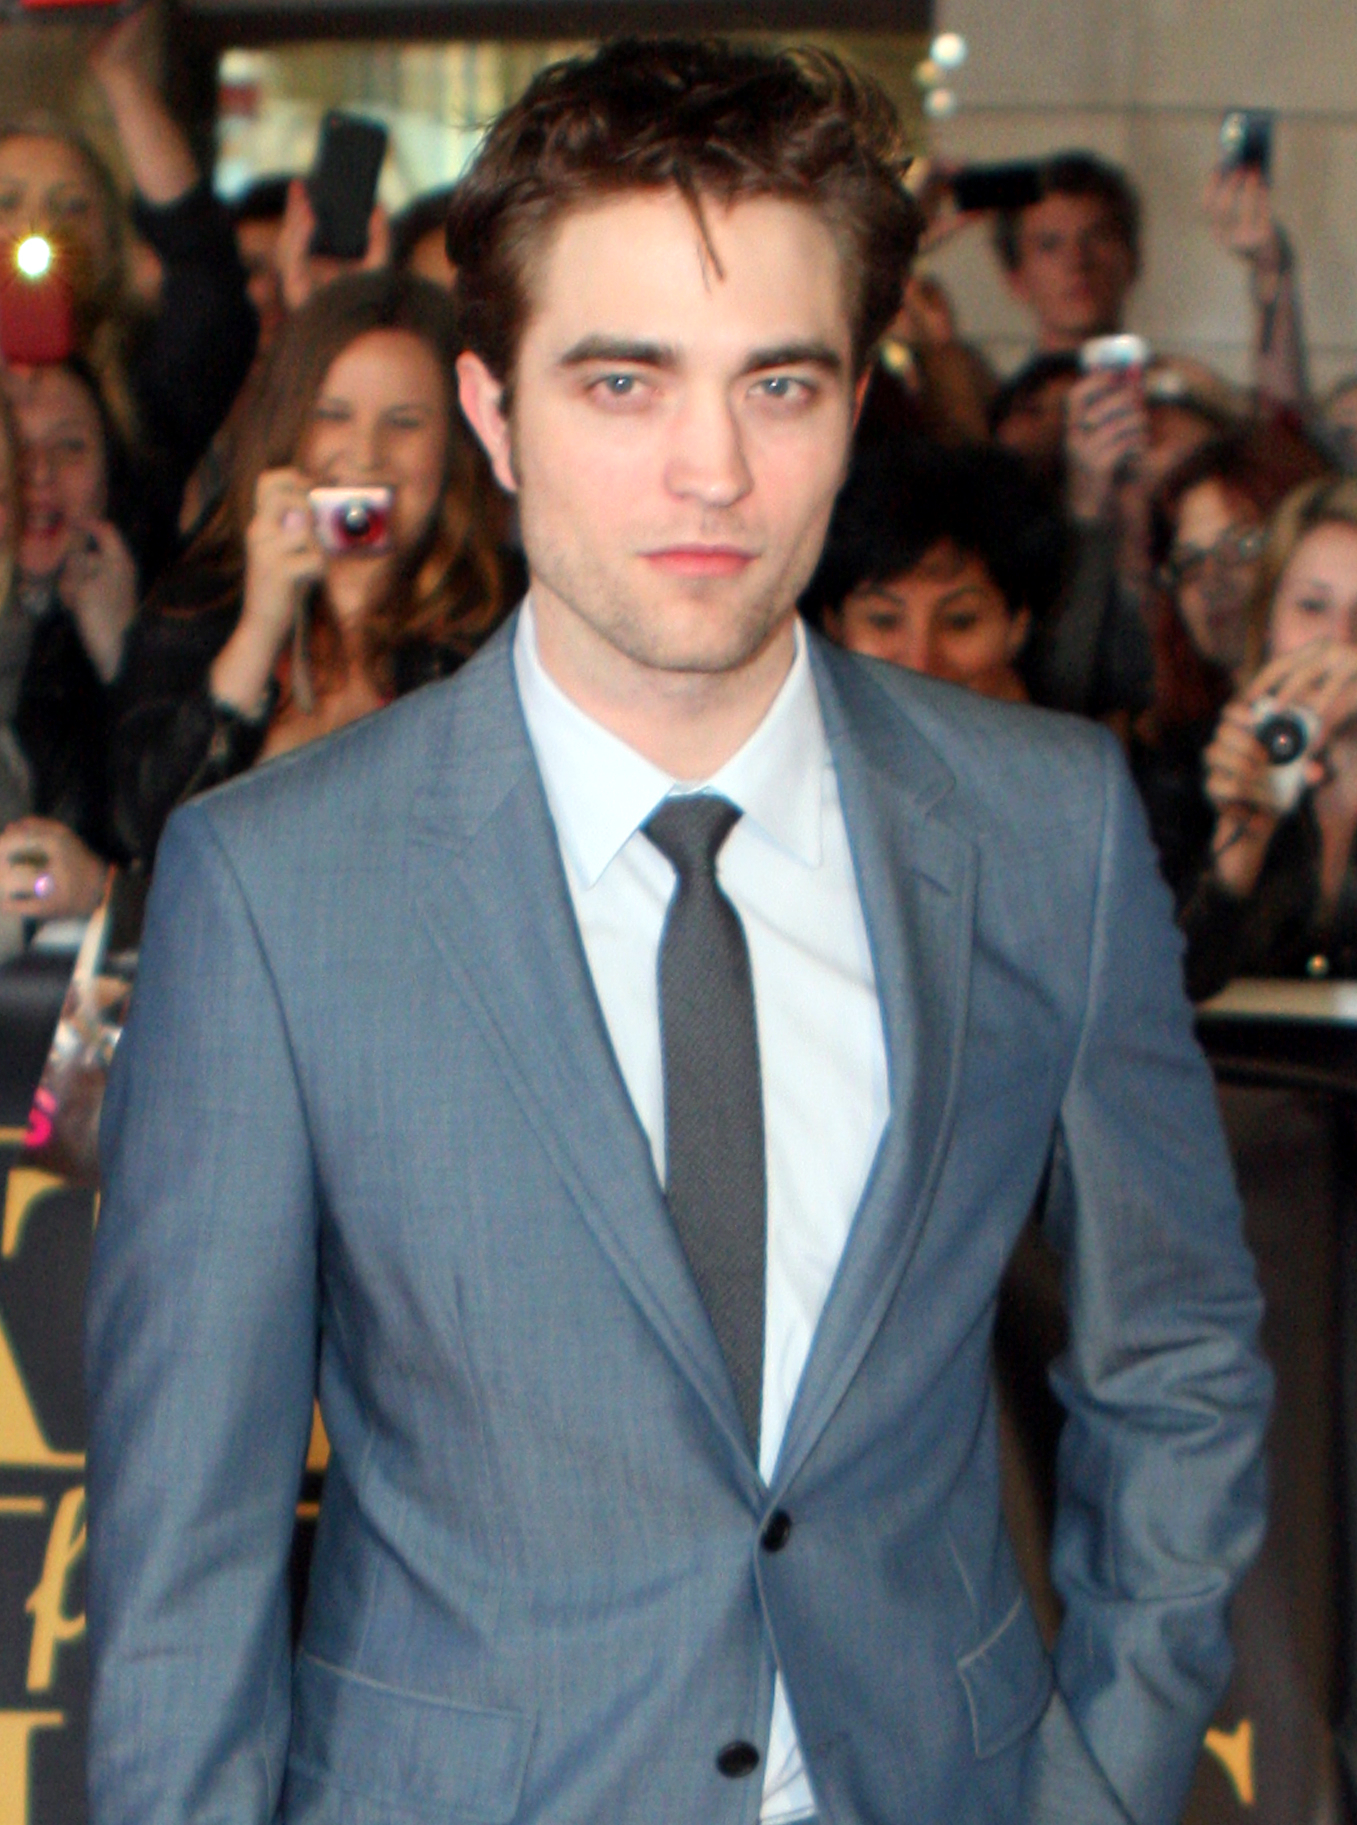 File:Robert Pattinson 2011.jpg - Wikimedia Commons Robert Pattinson